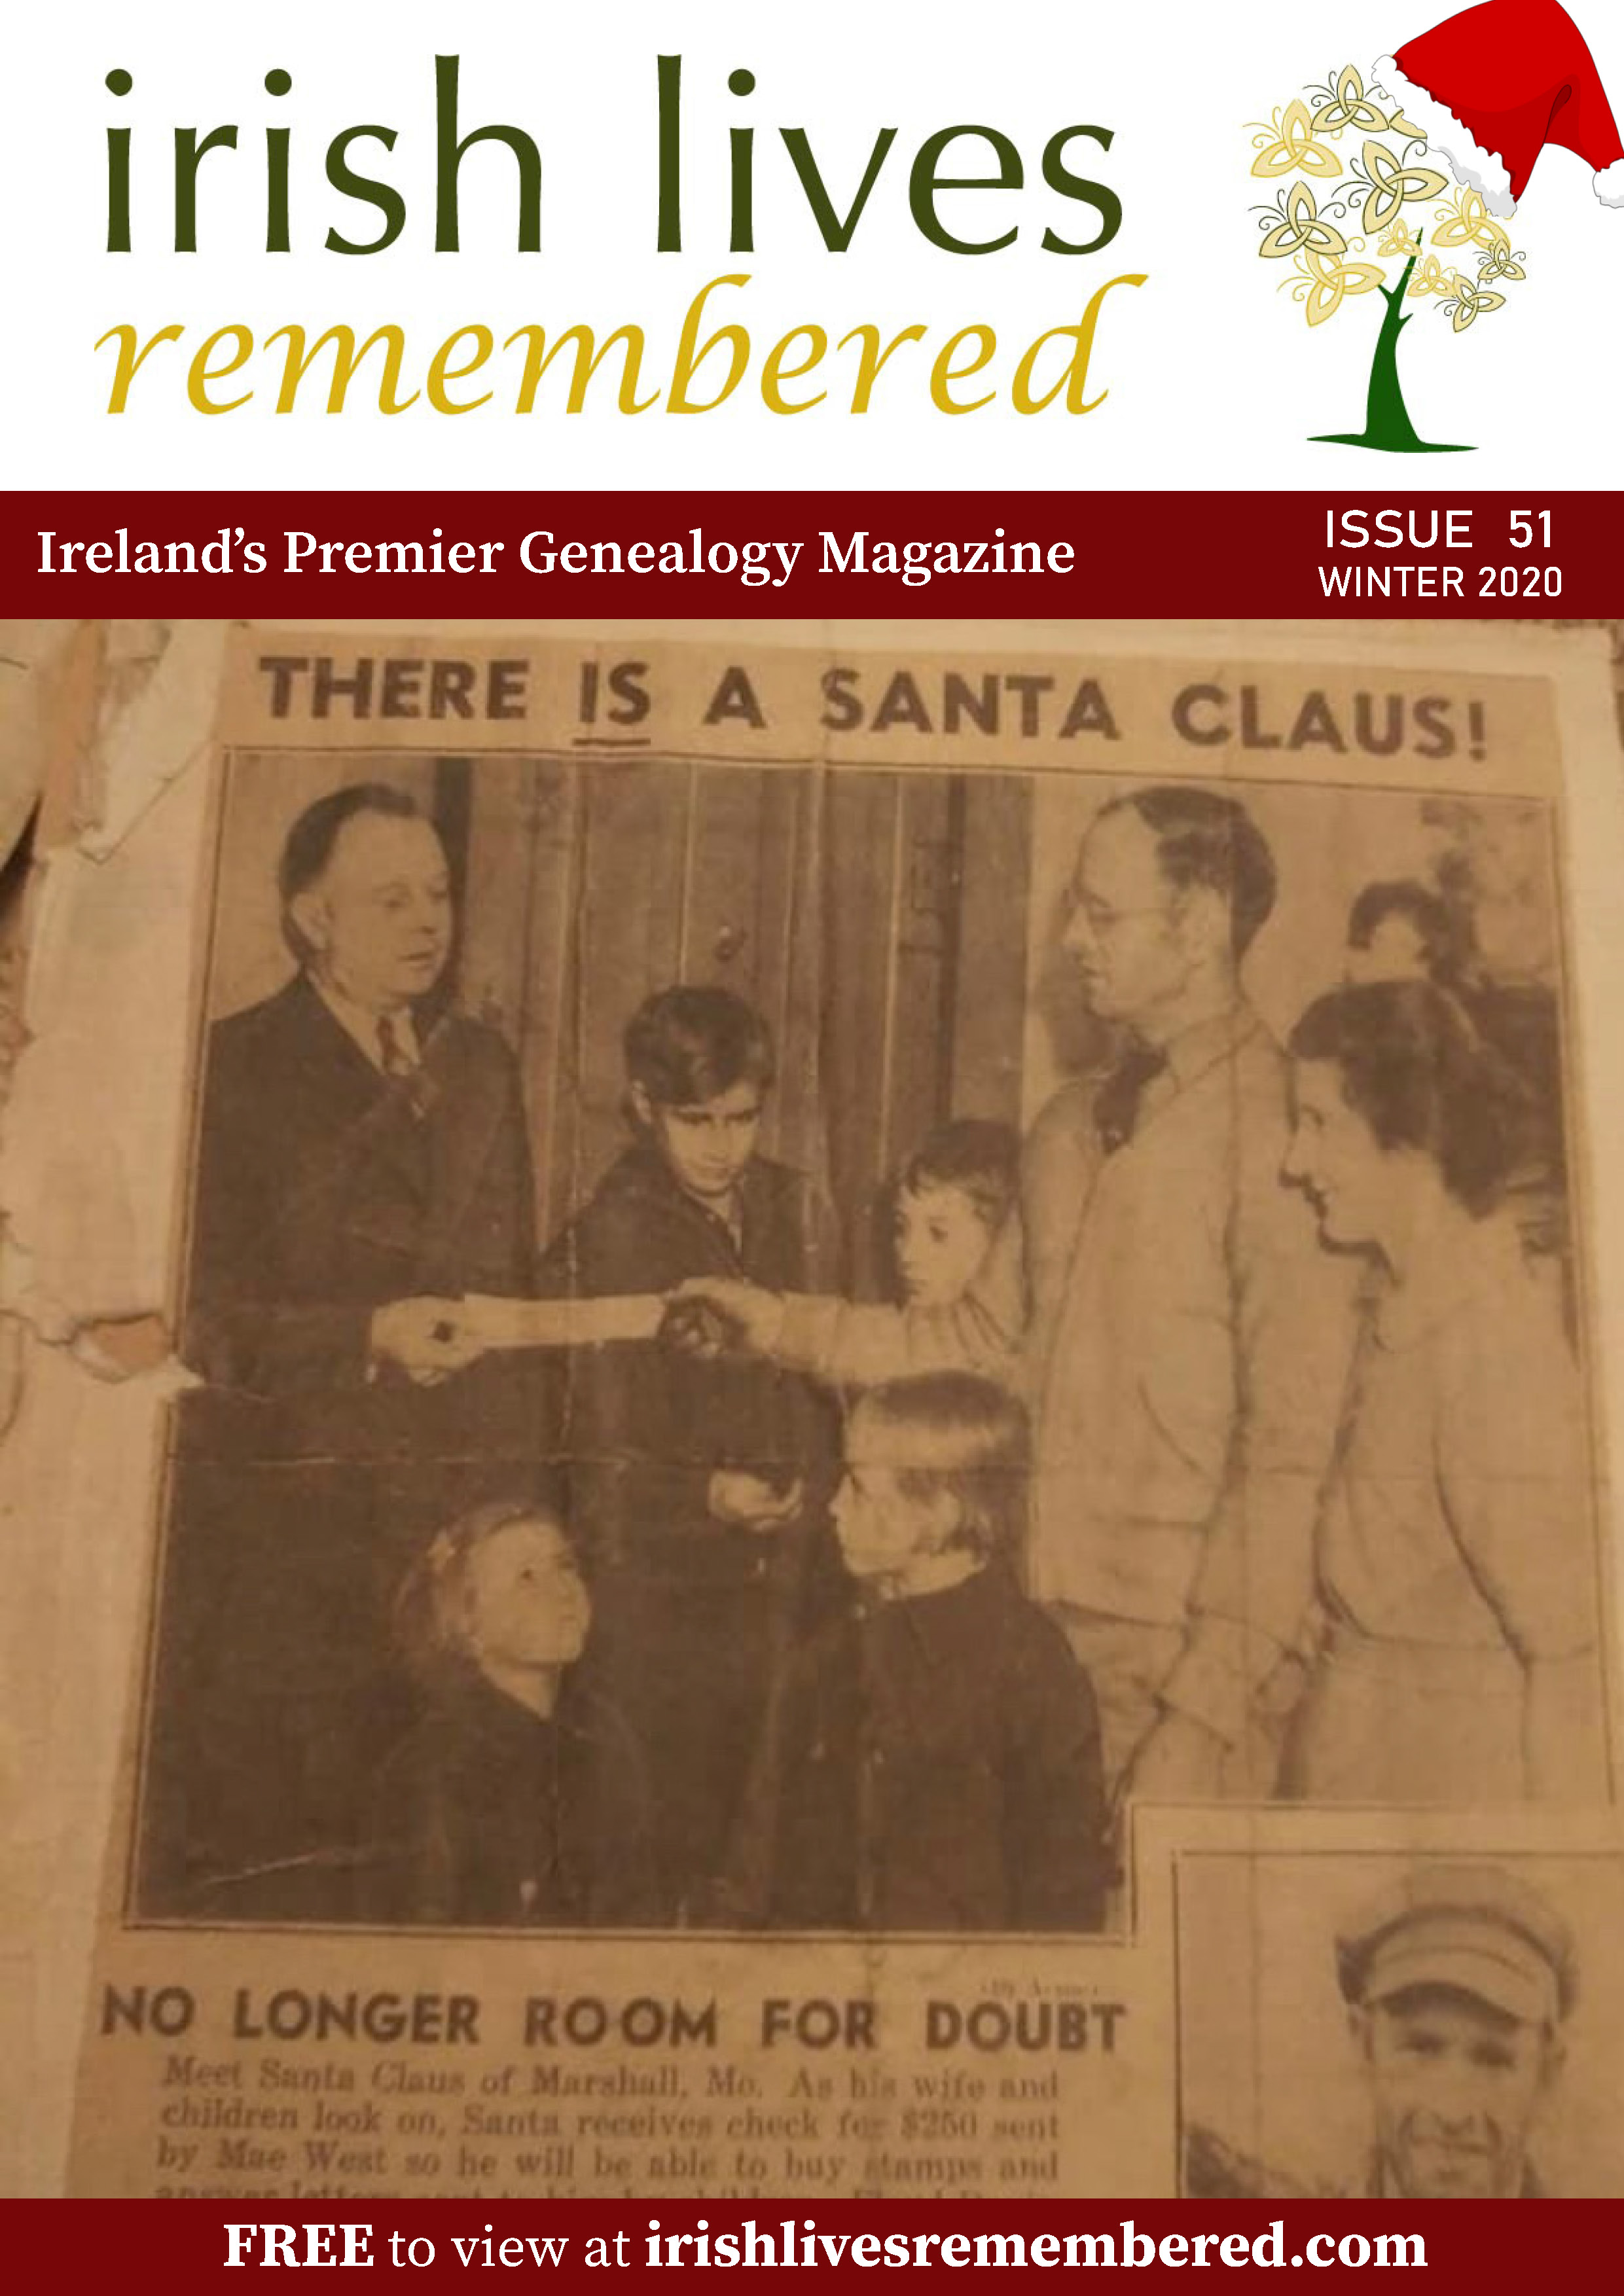 photo of Irish Lives Remembered Issue 51 Winter 2020